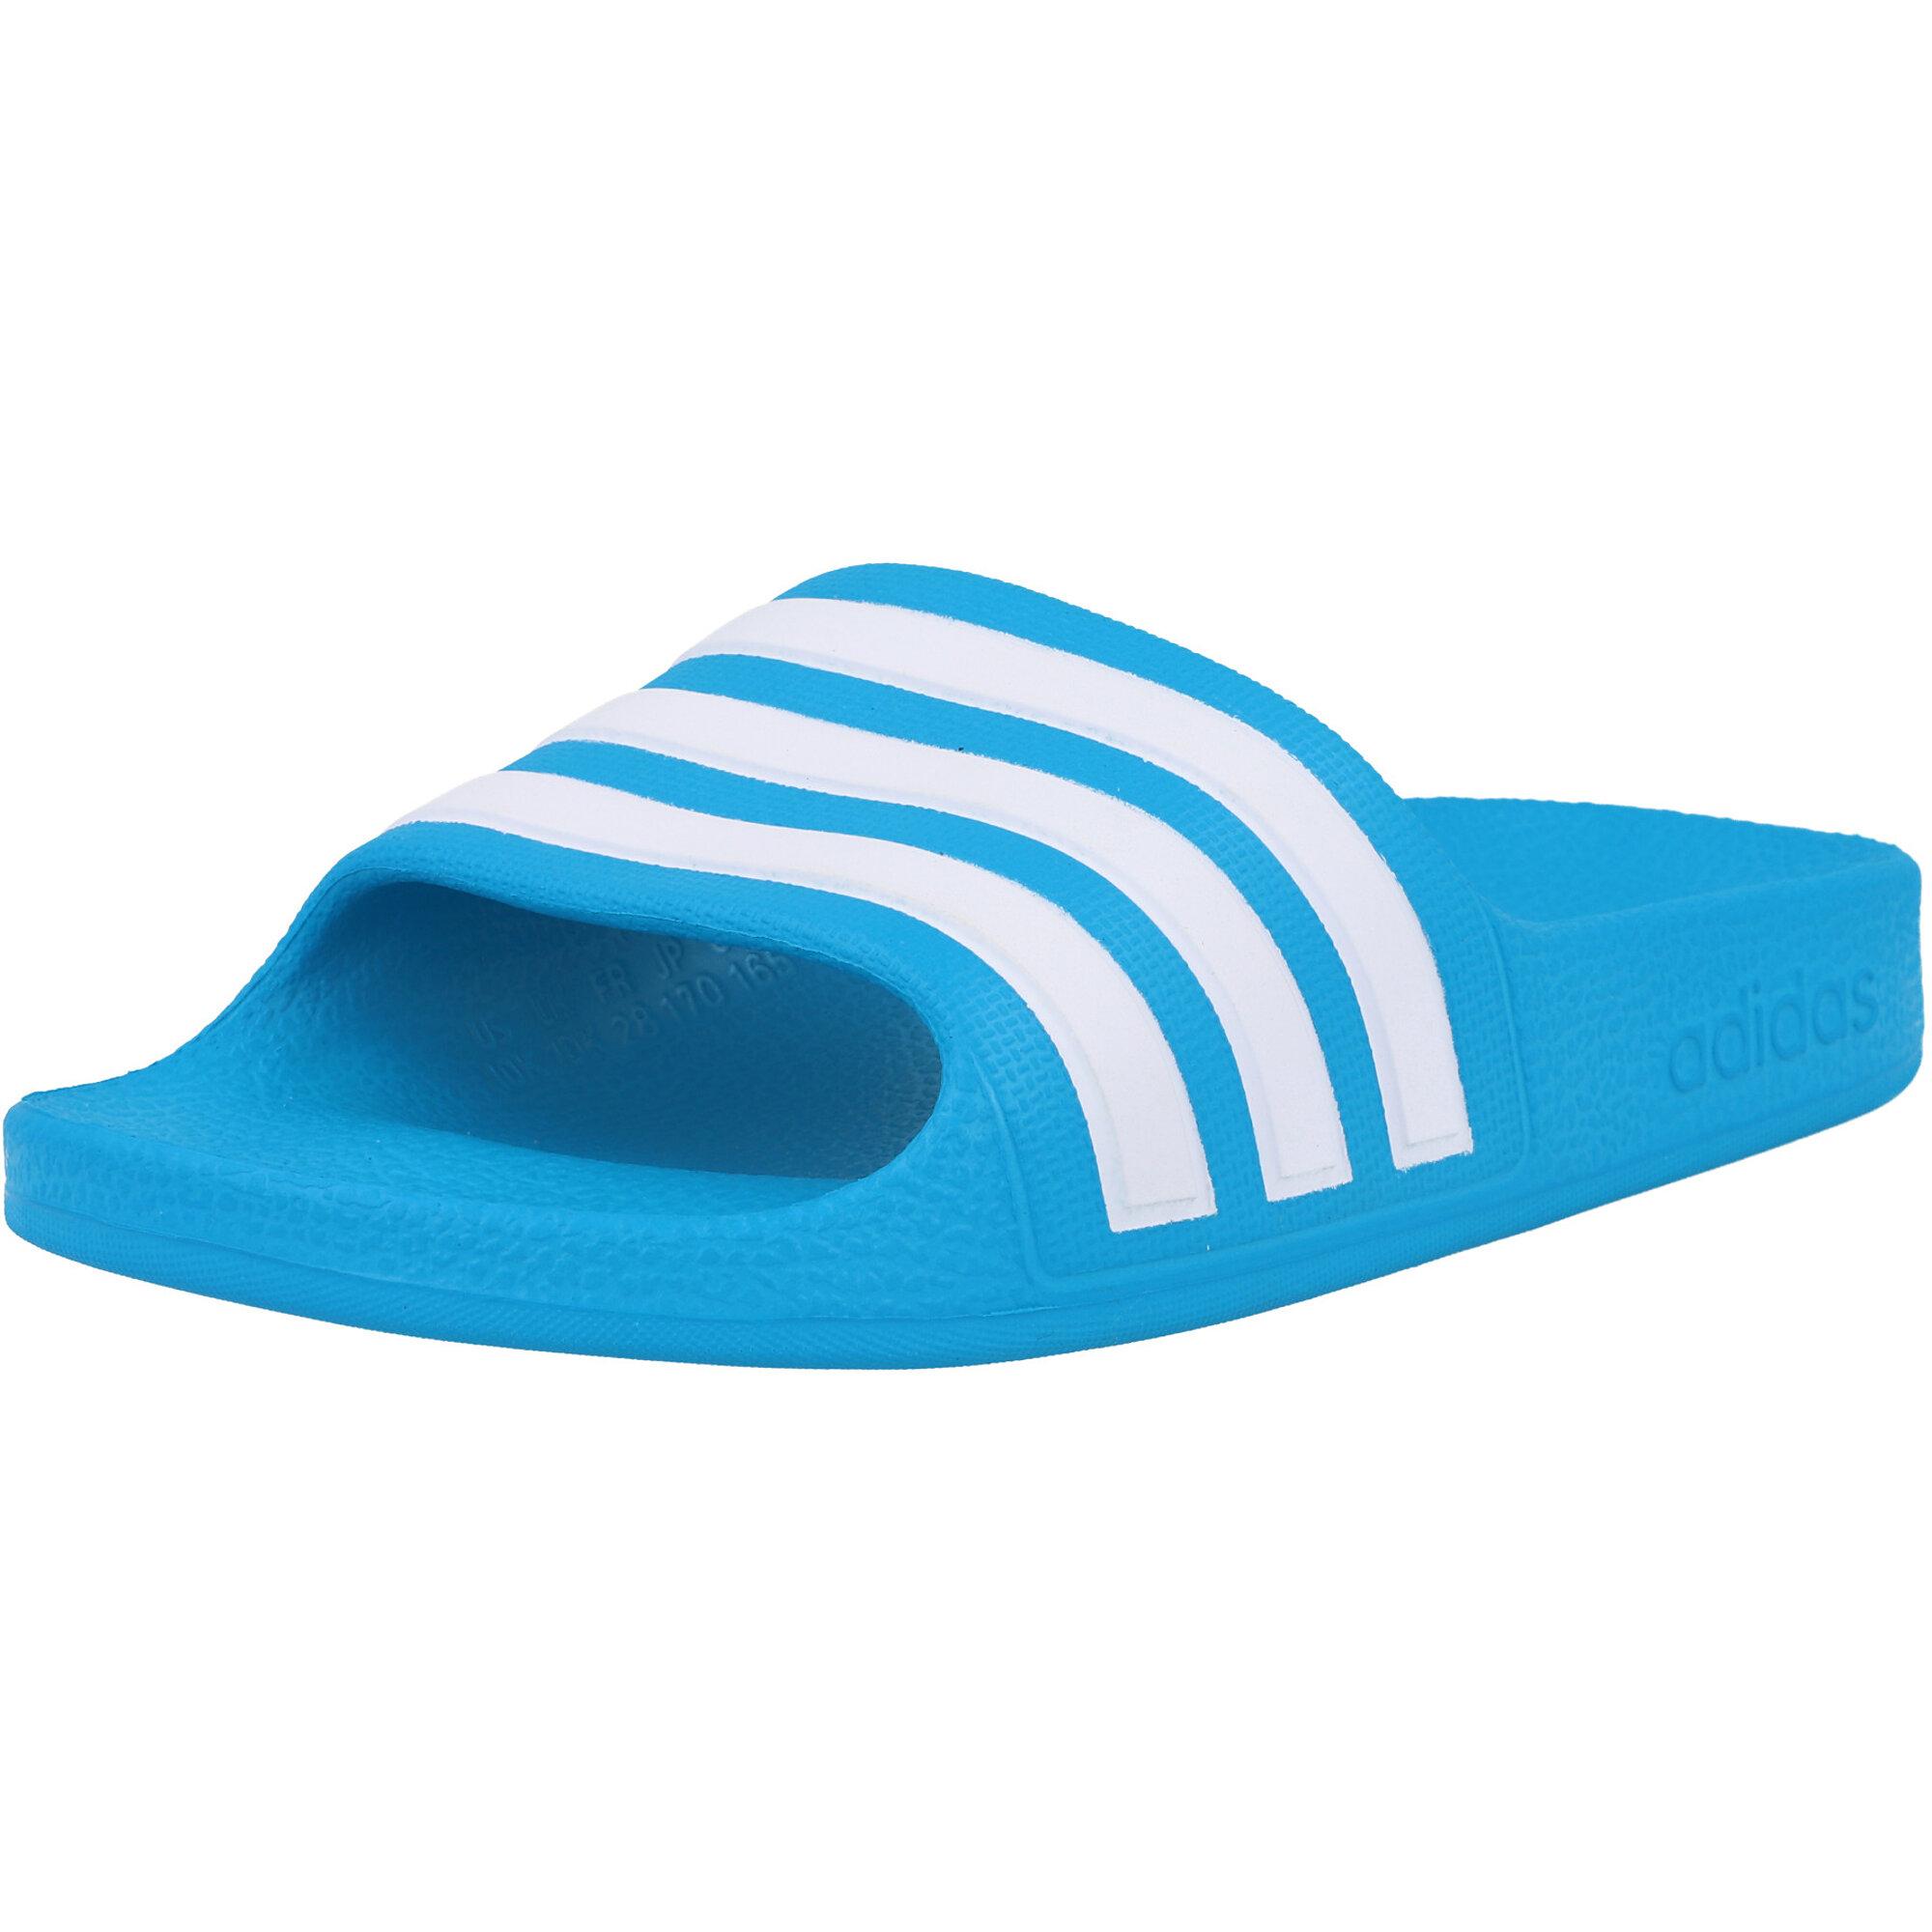 adidas adilette Aqua K Blue/White Synthetic